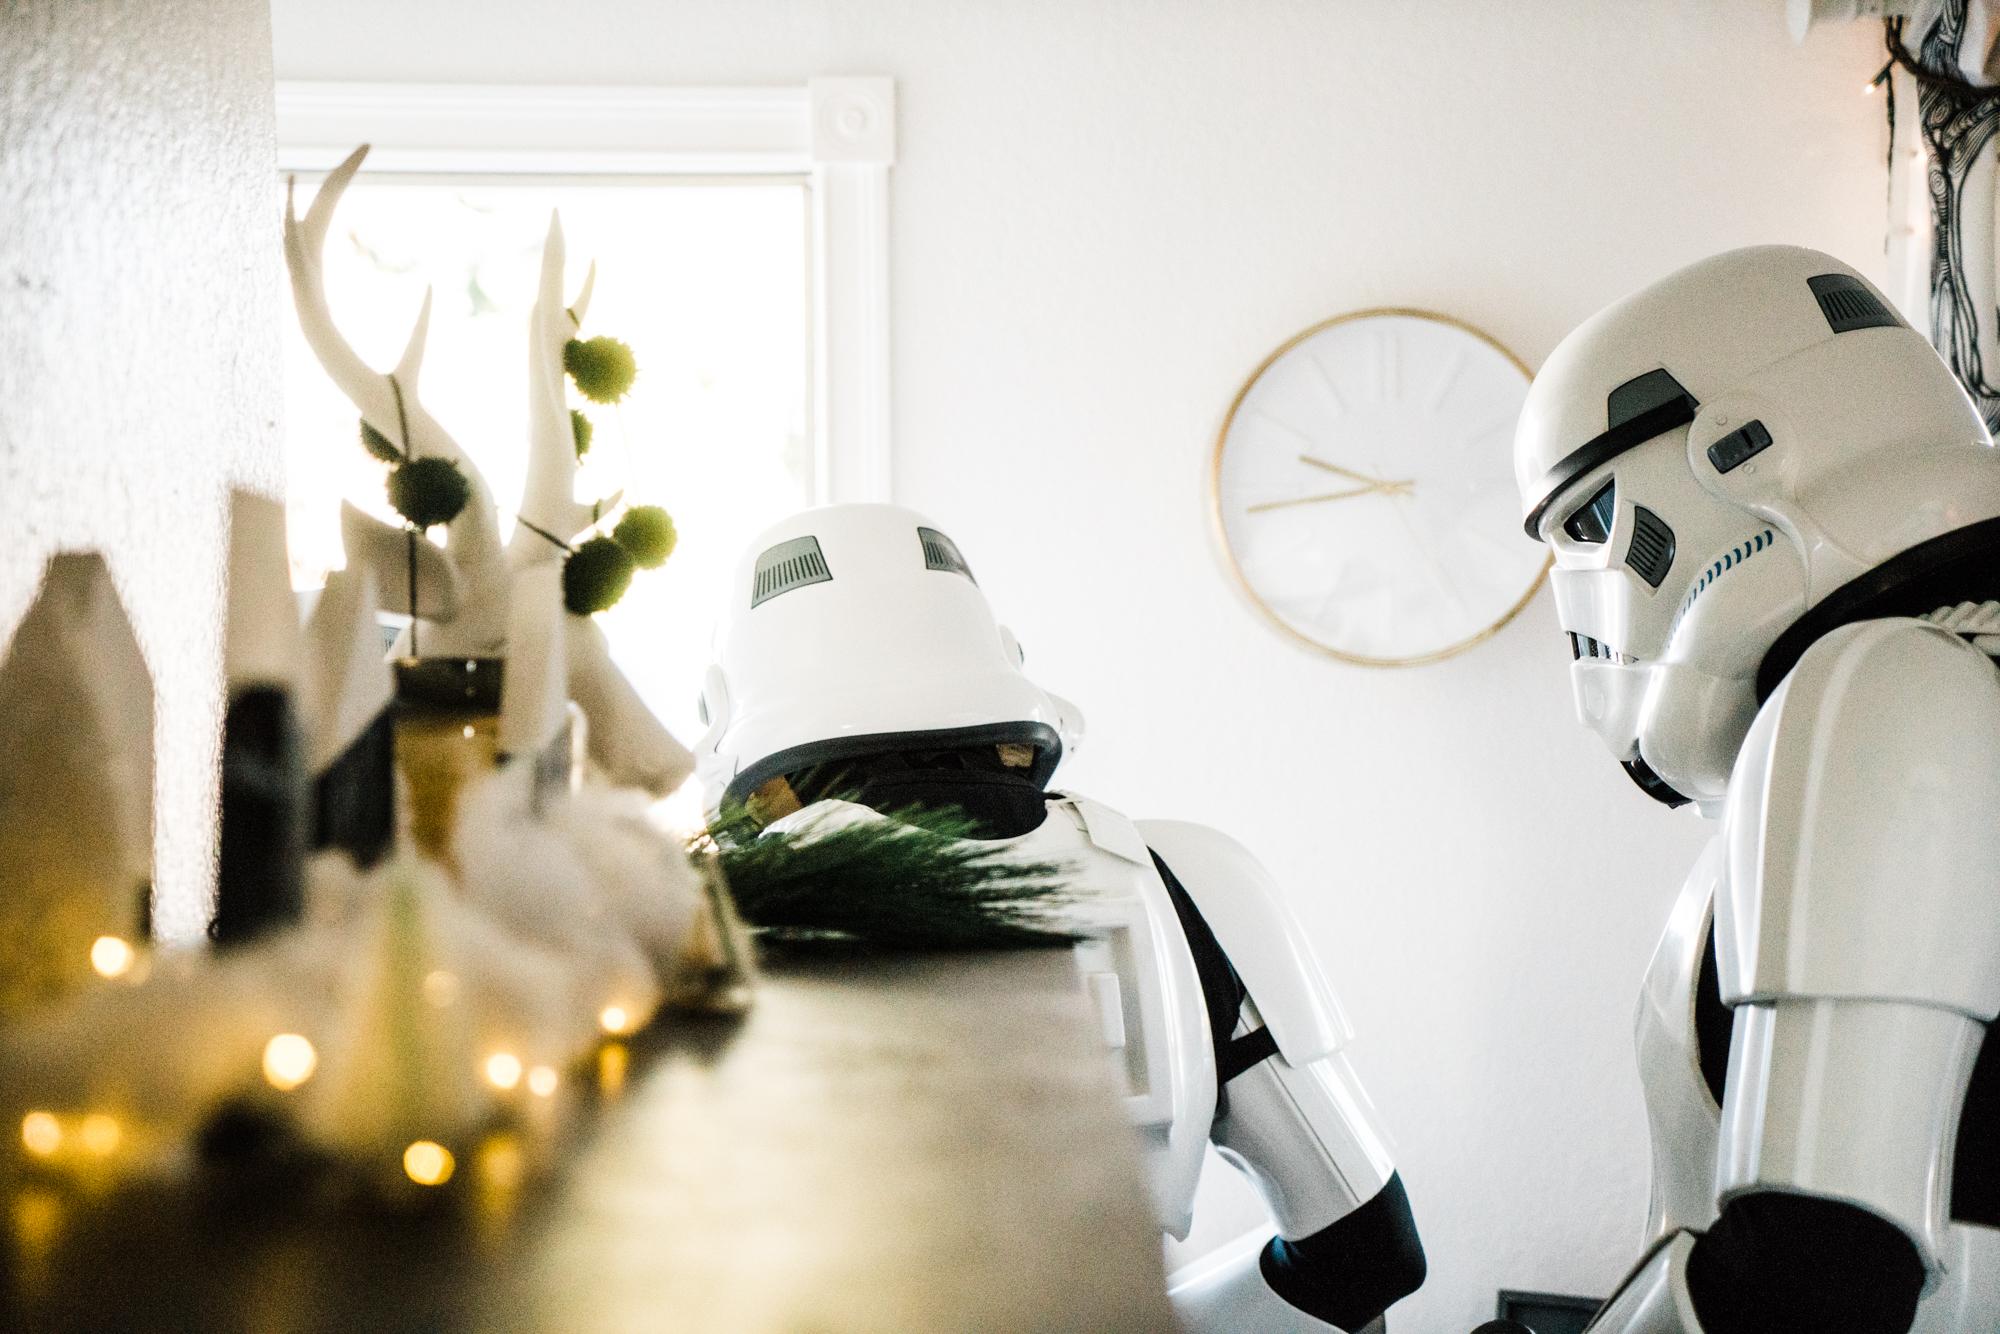 A Star Wars Holiday (Photo Story)-14.jpg